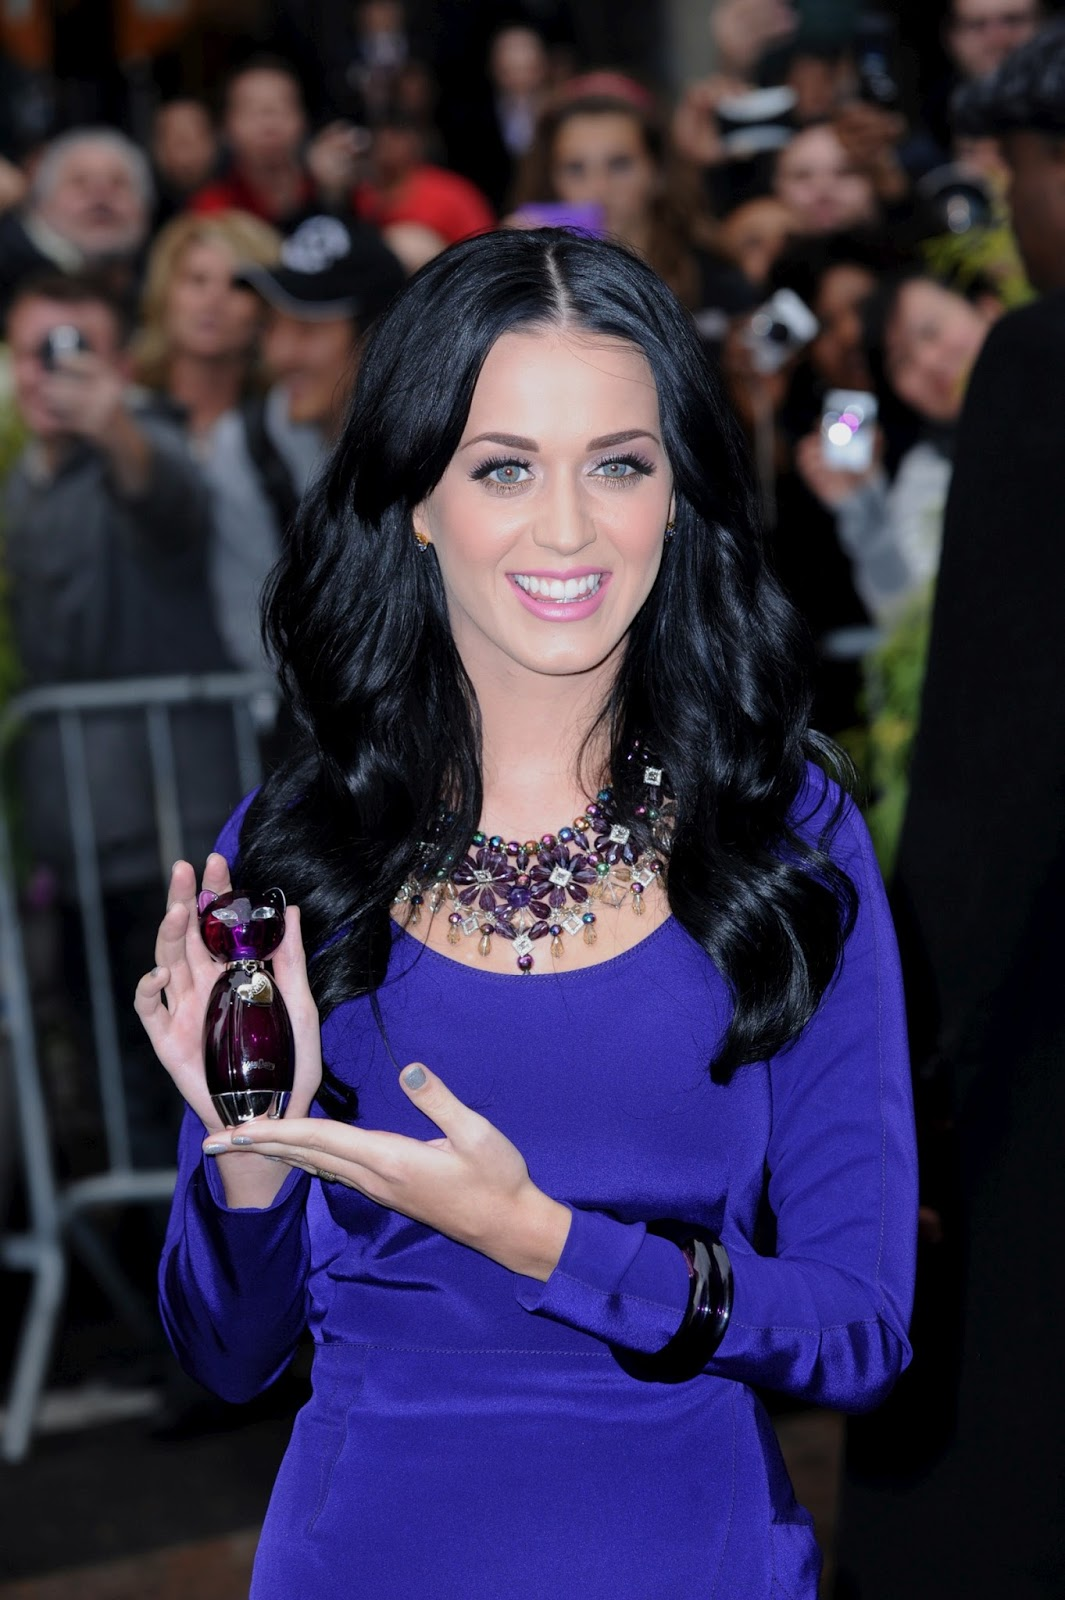 Wallpaper Katy Perry Queen Of Jungle